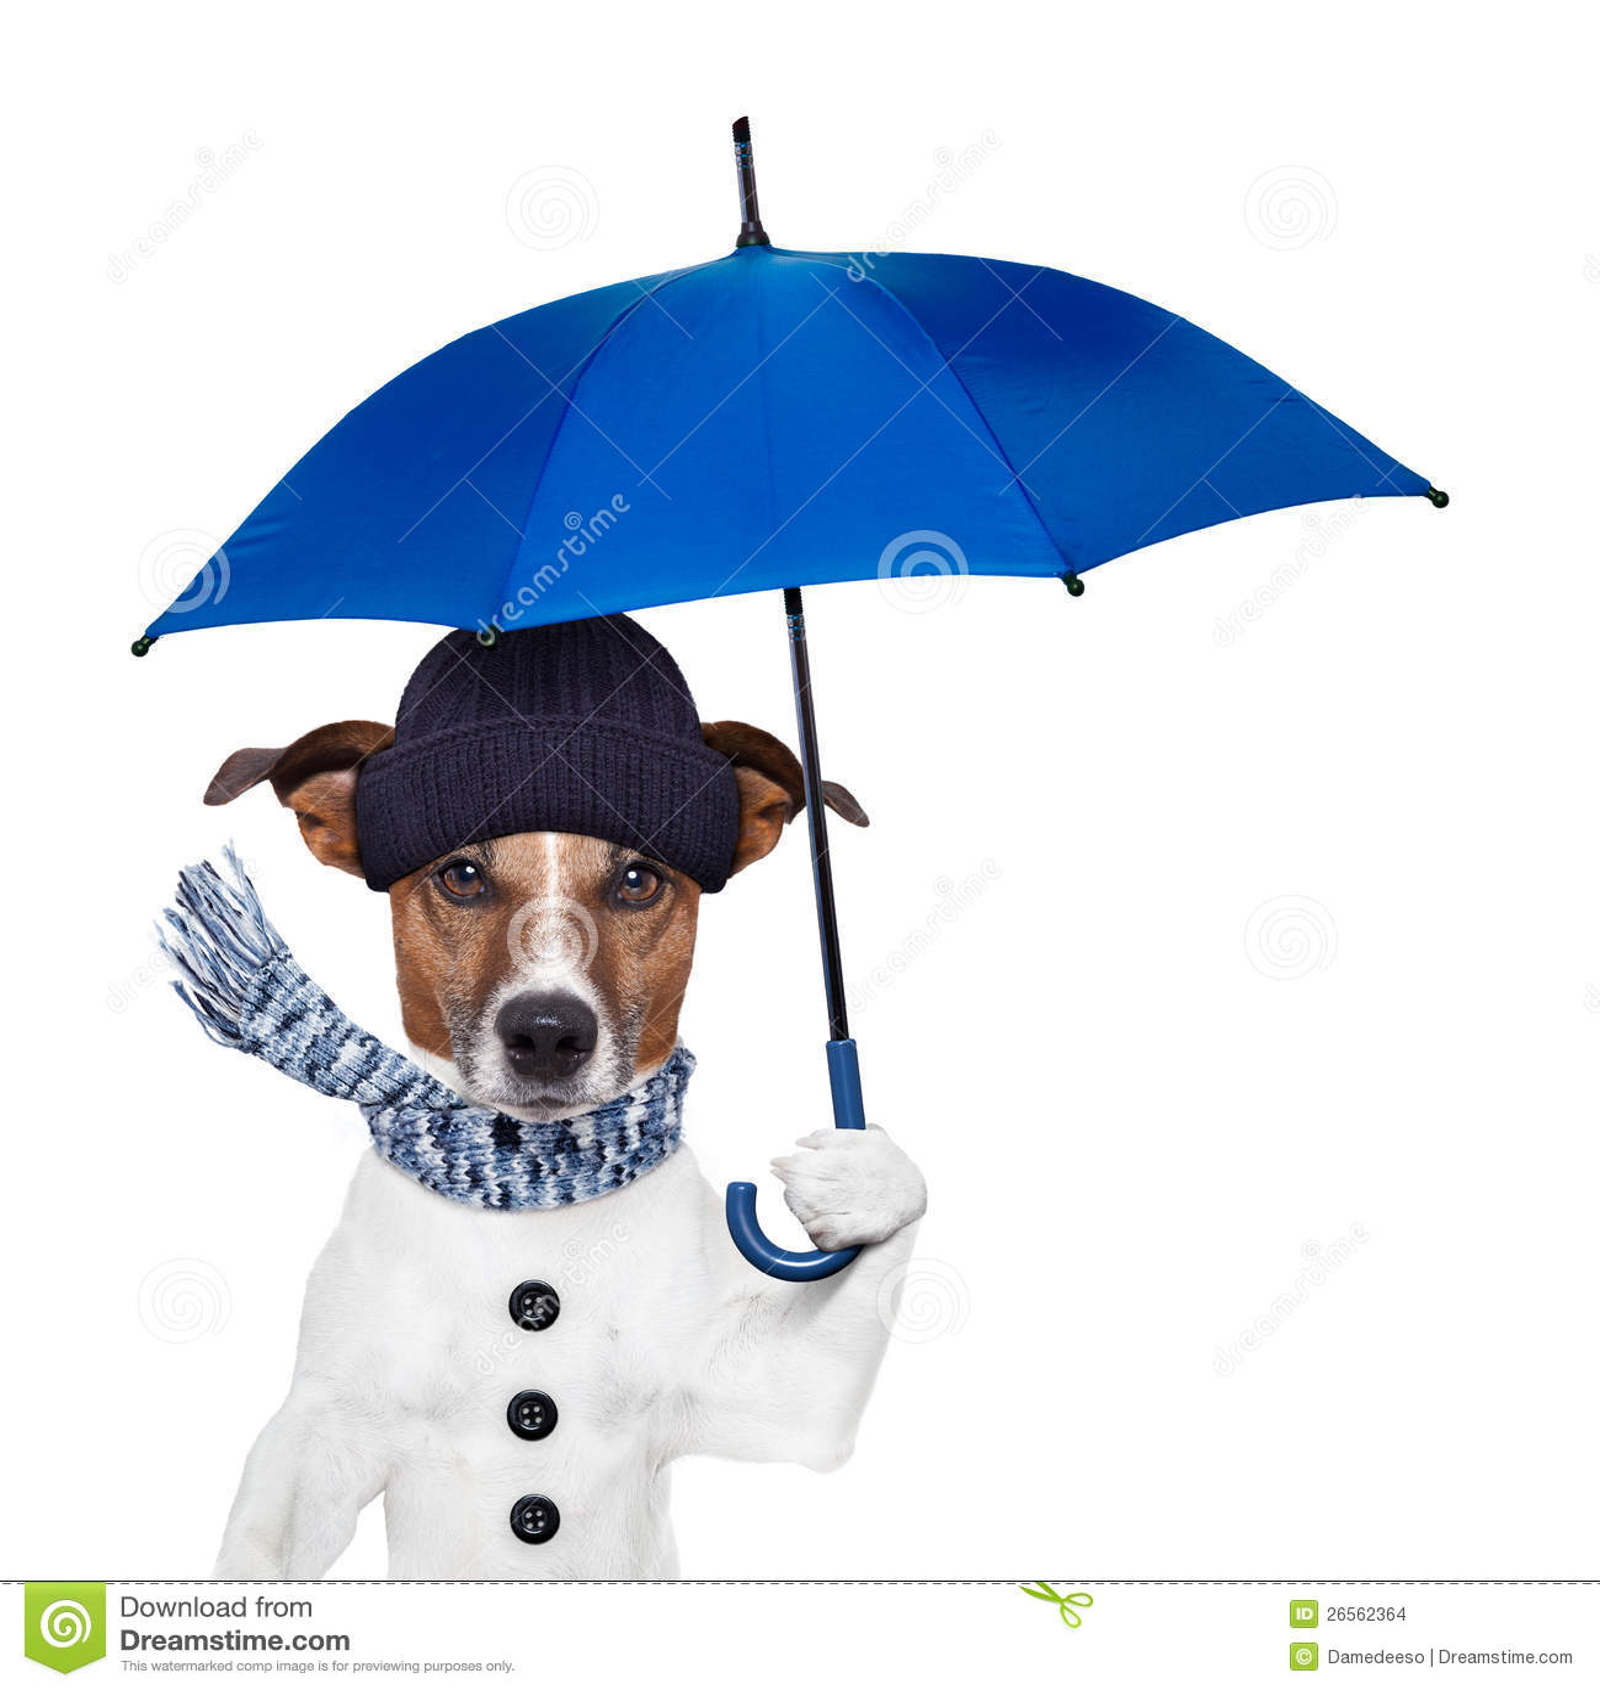 rain umbrella dog stock images   image 26562364